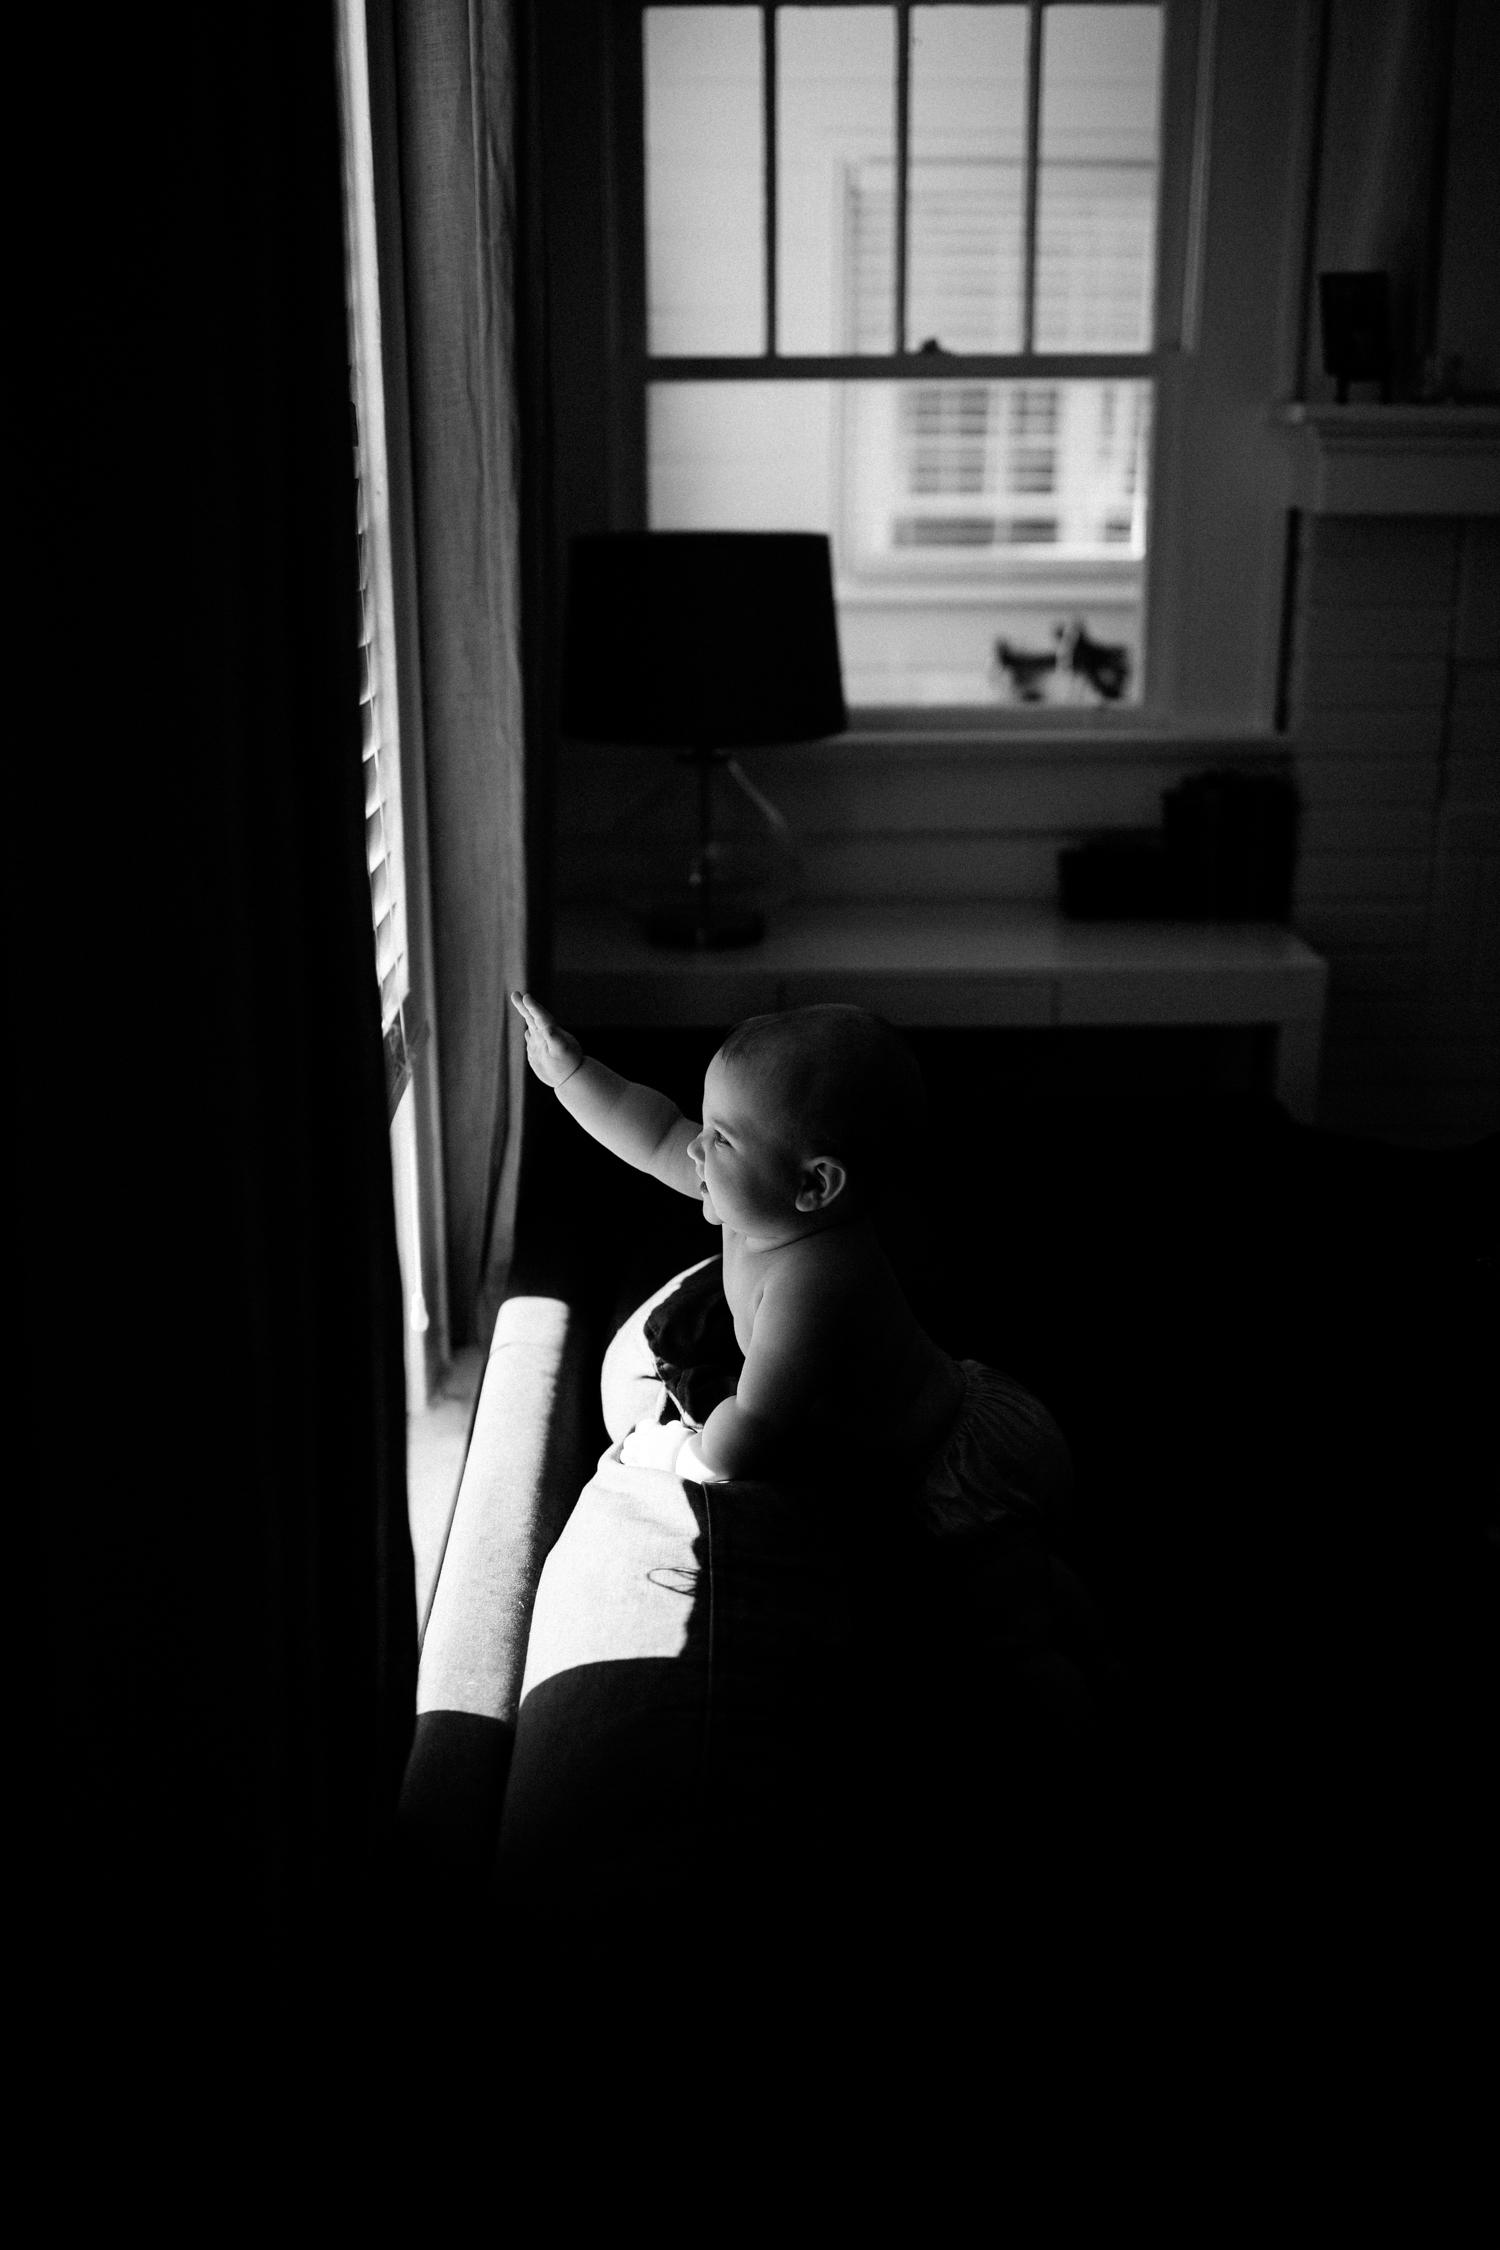 atlanta-nontraditional-family-photographer-5569